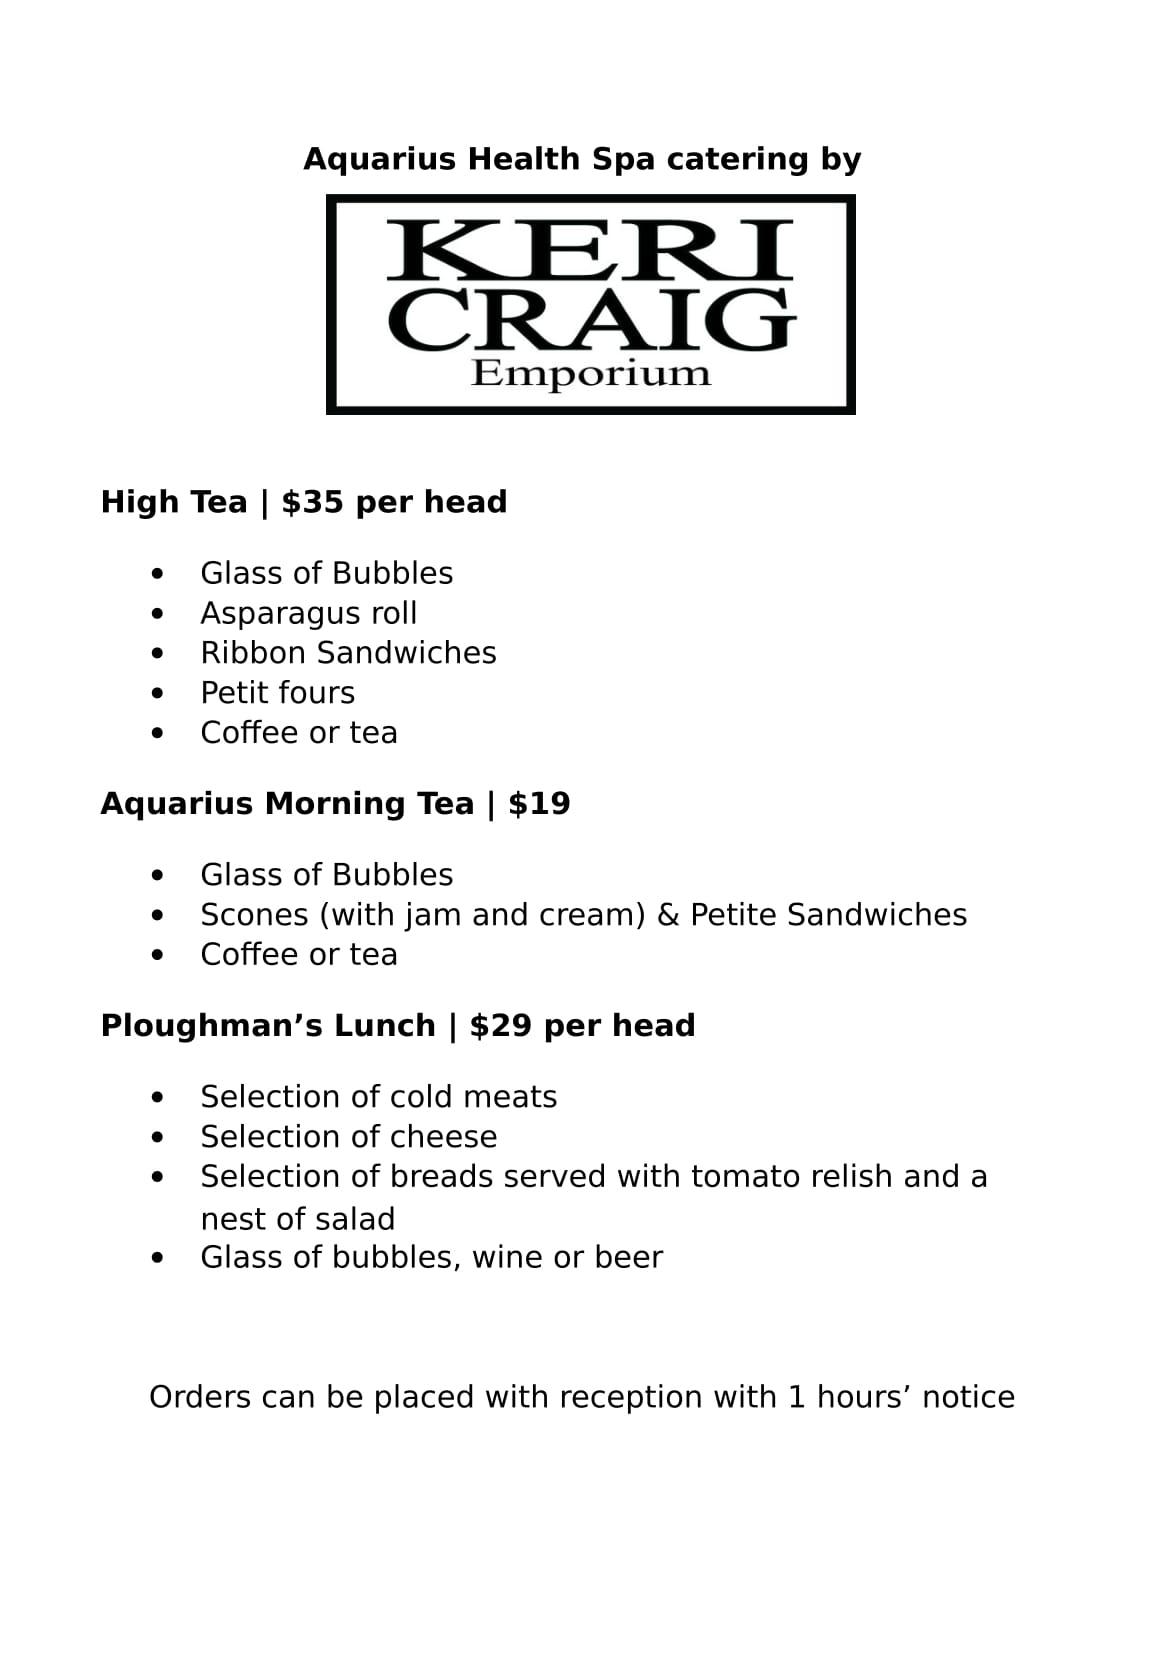 kerri-craig-catering-menu-1